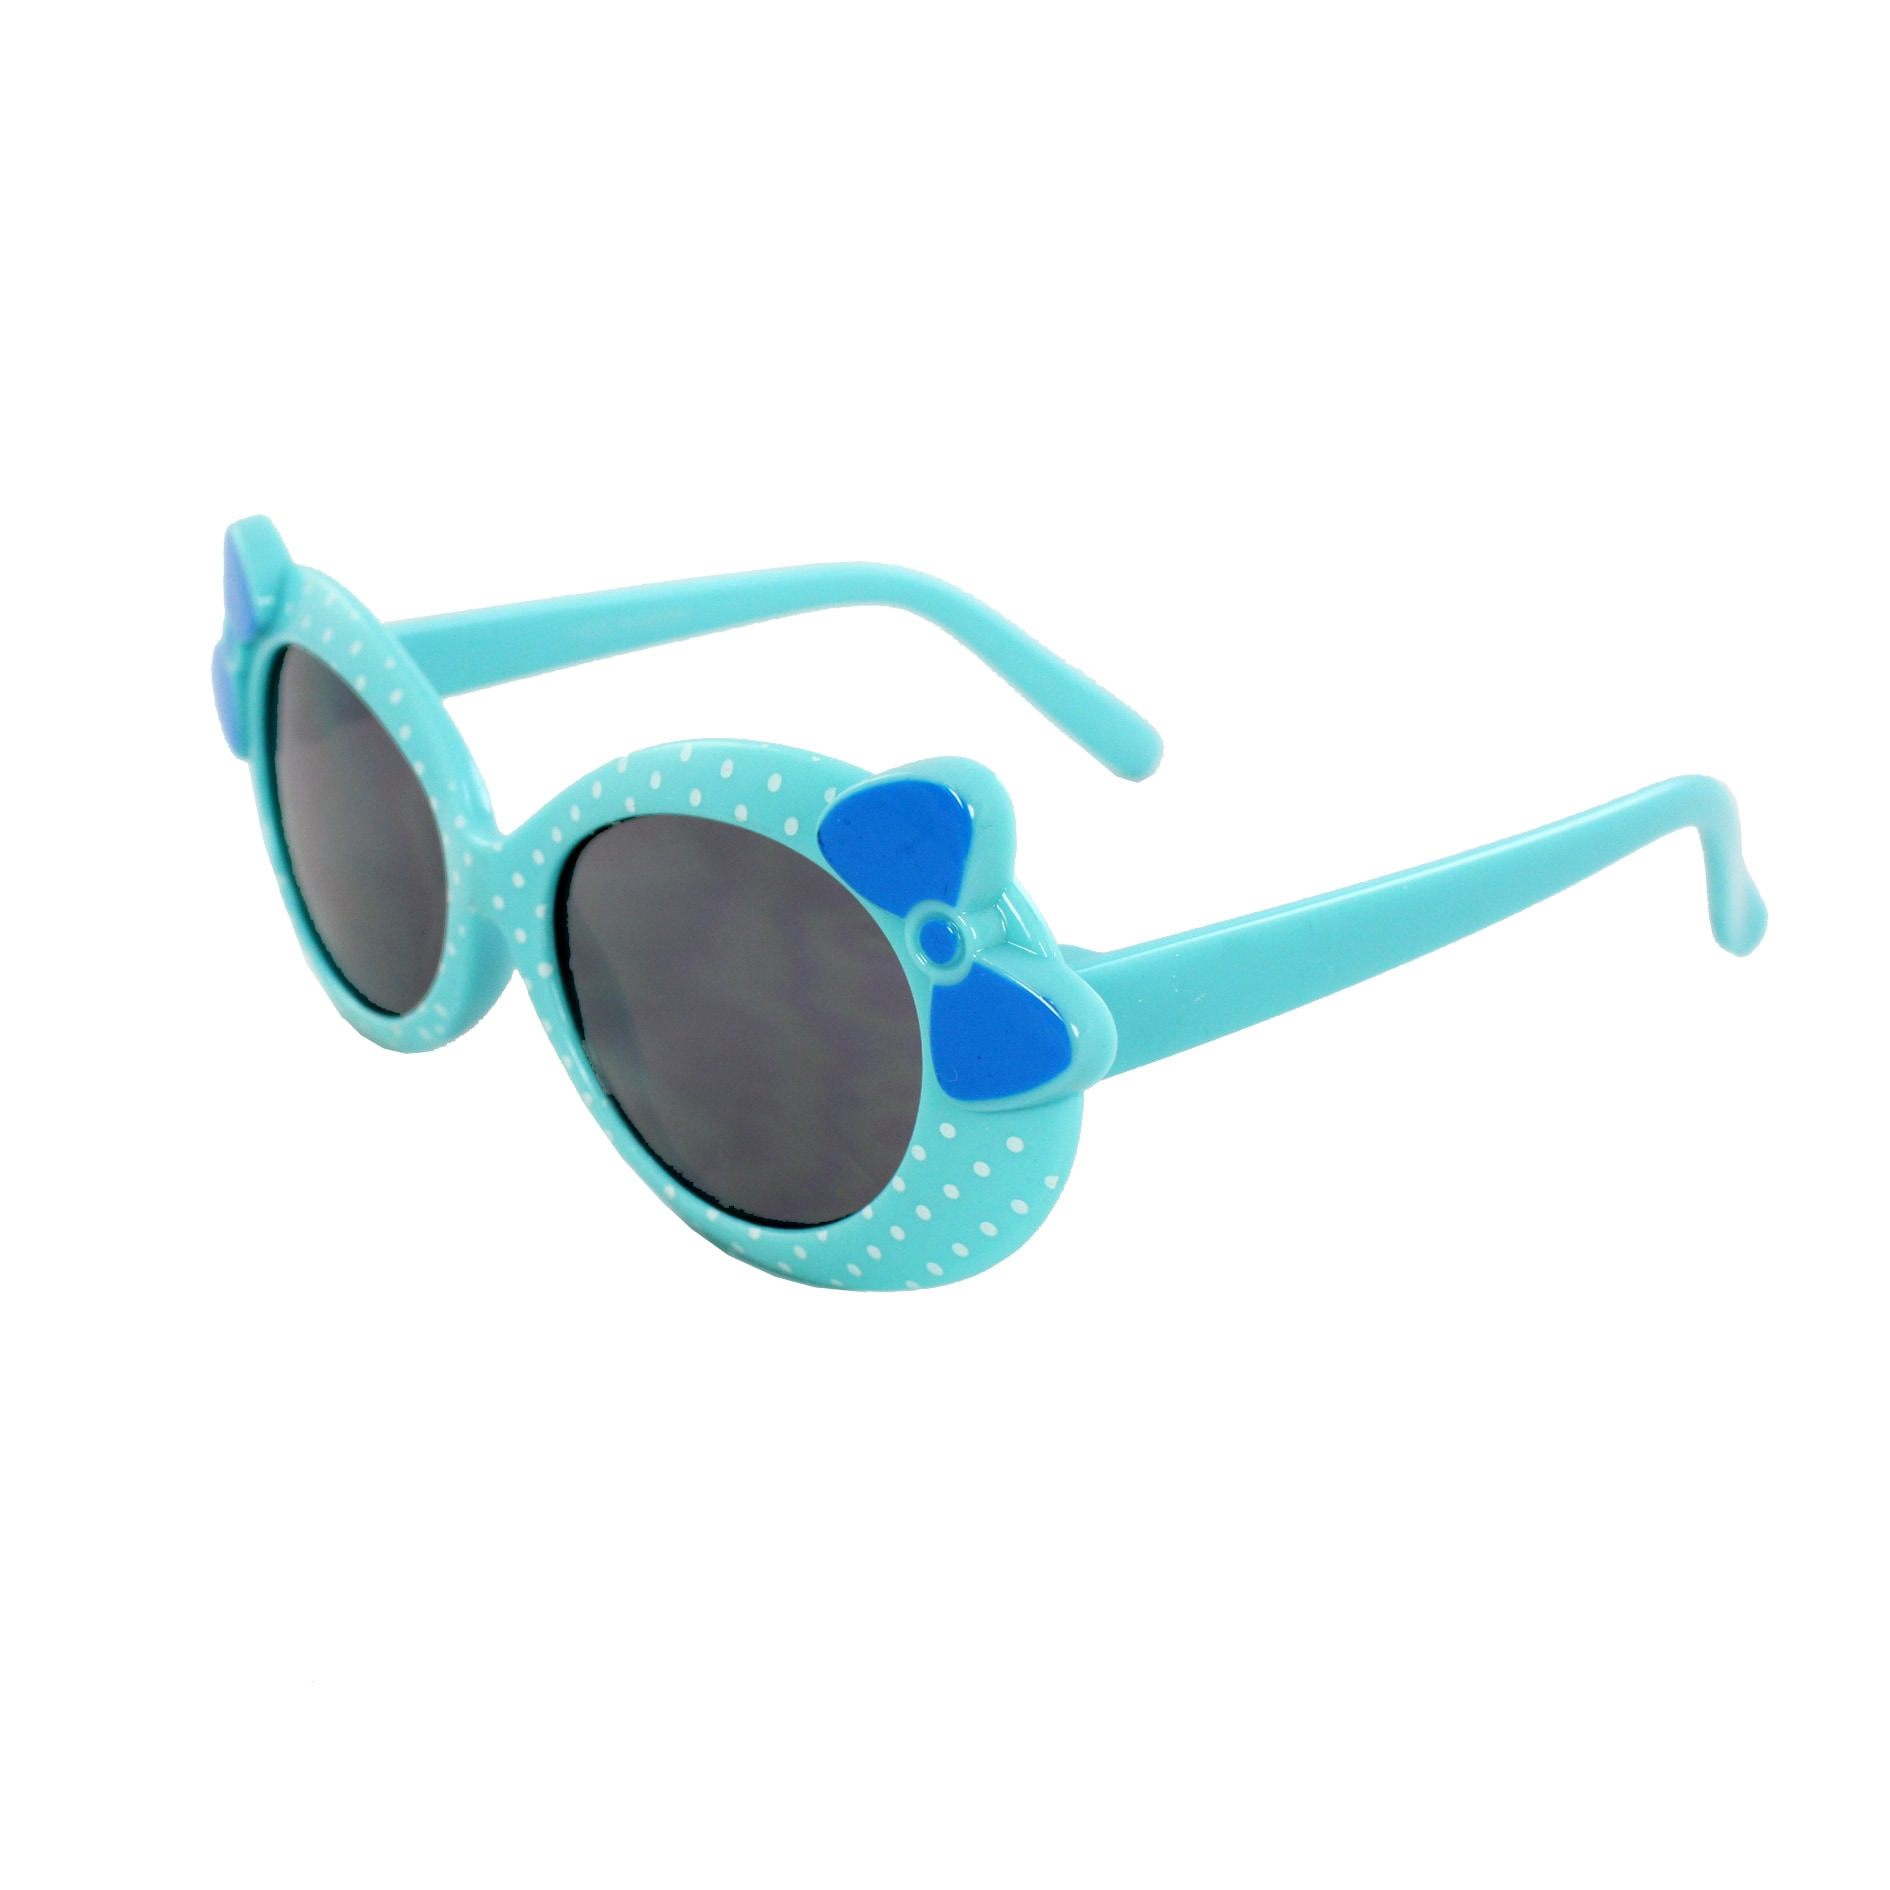 Kid's K0208-BUSM Oval Fashion Blue Frame Polka Dot Sunglasses